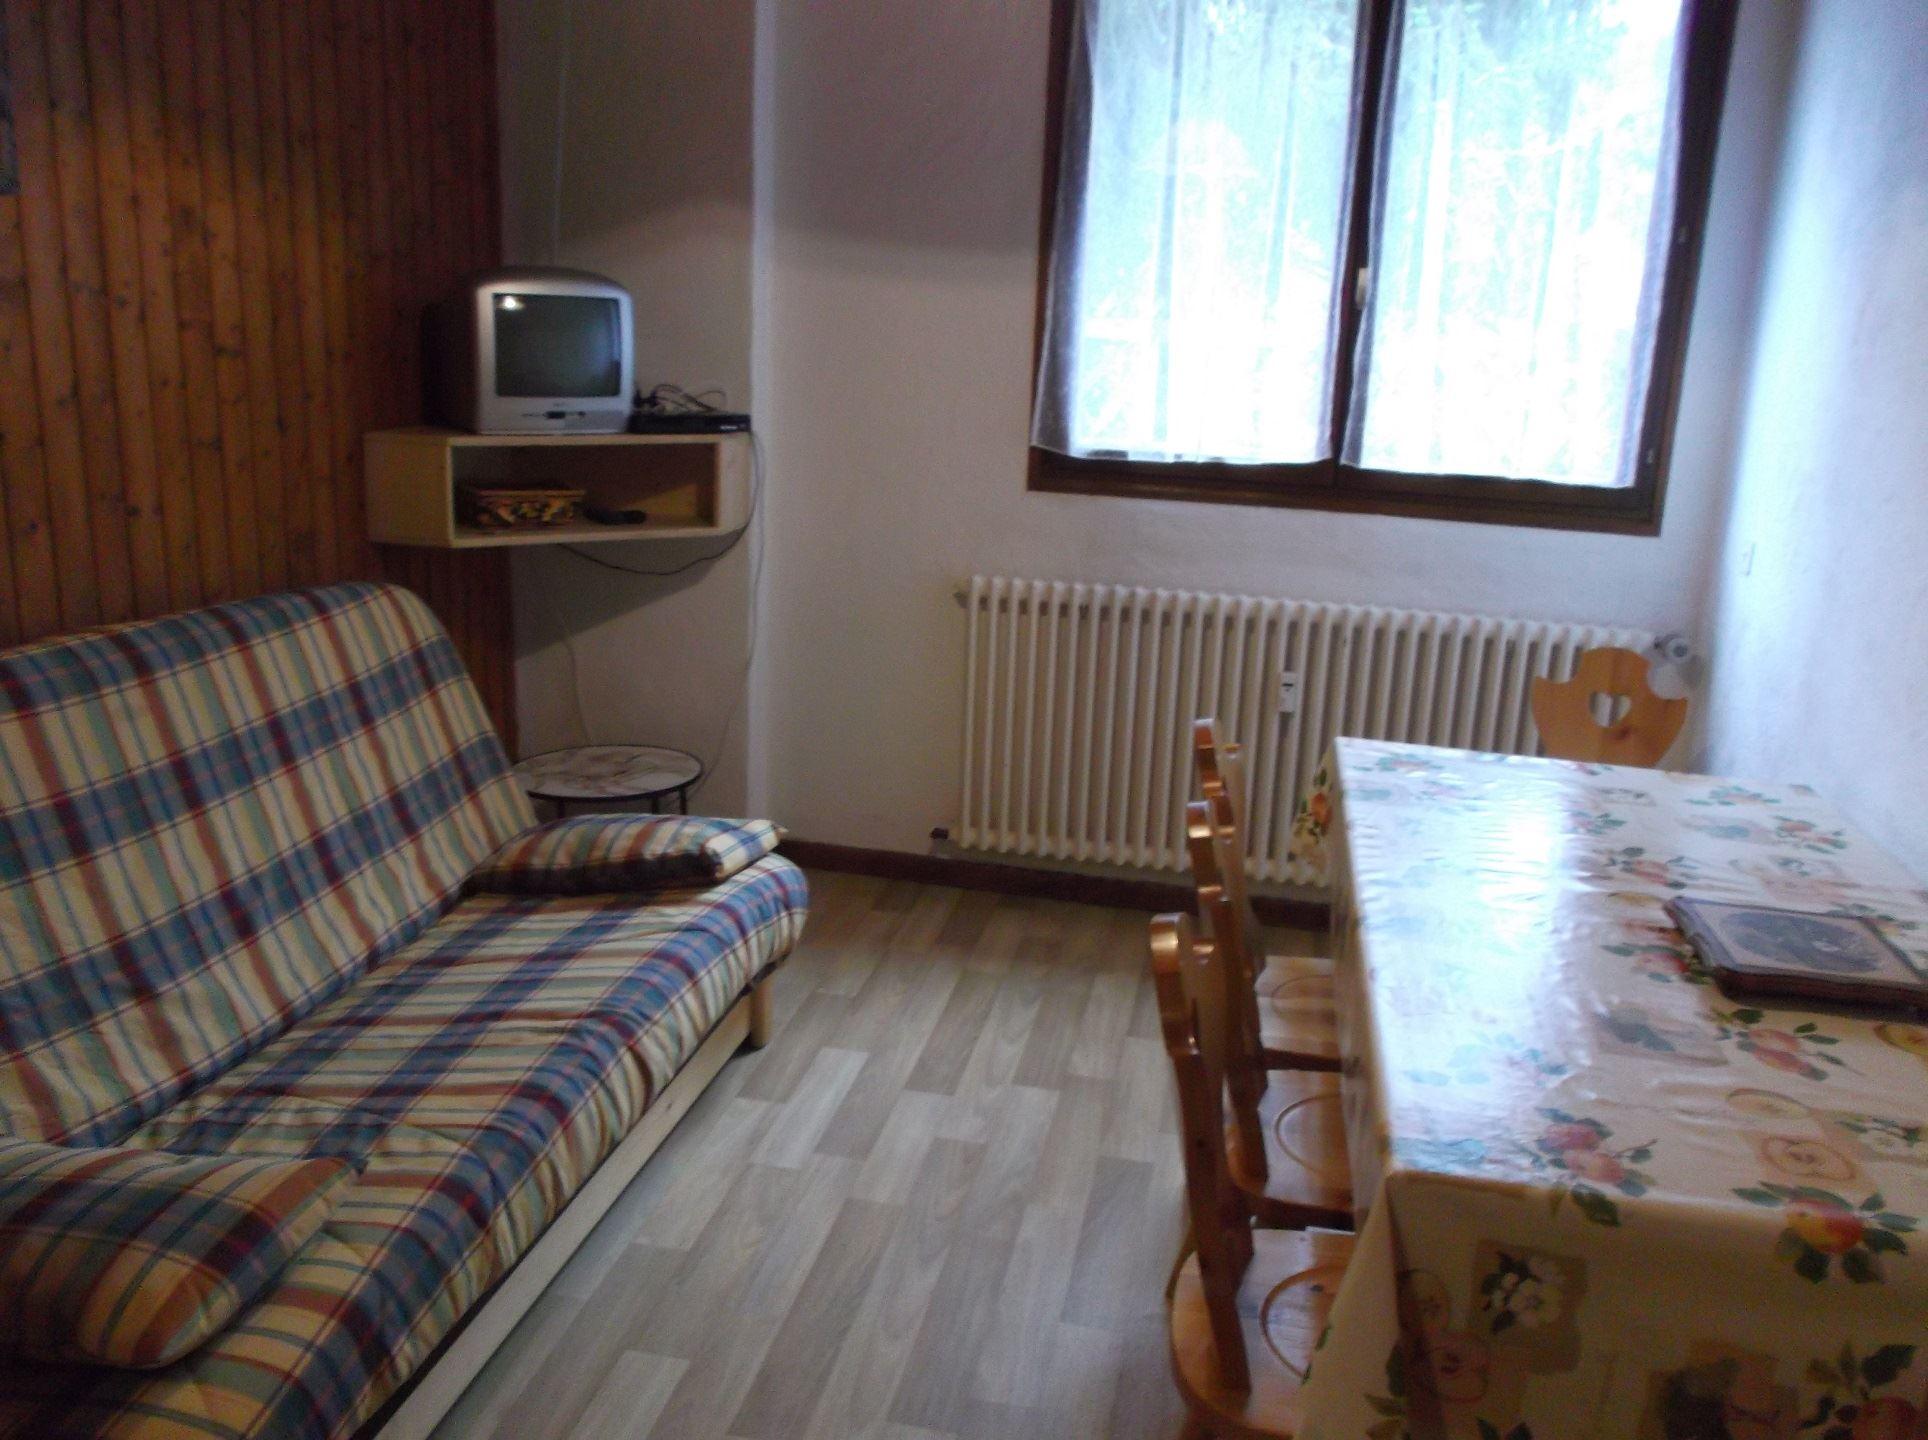 Flambée - 2 rooms** - 4 people